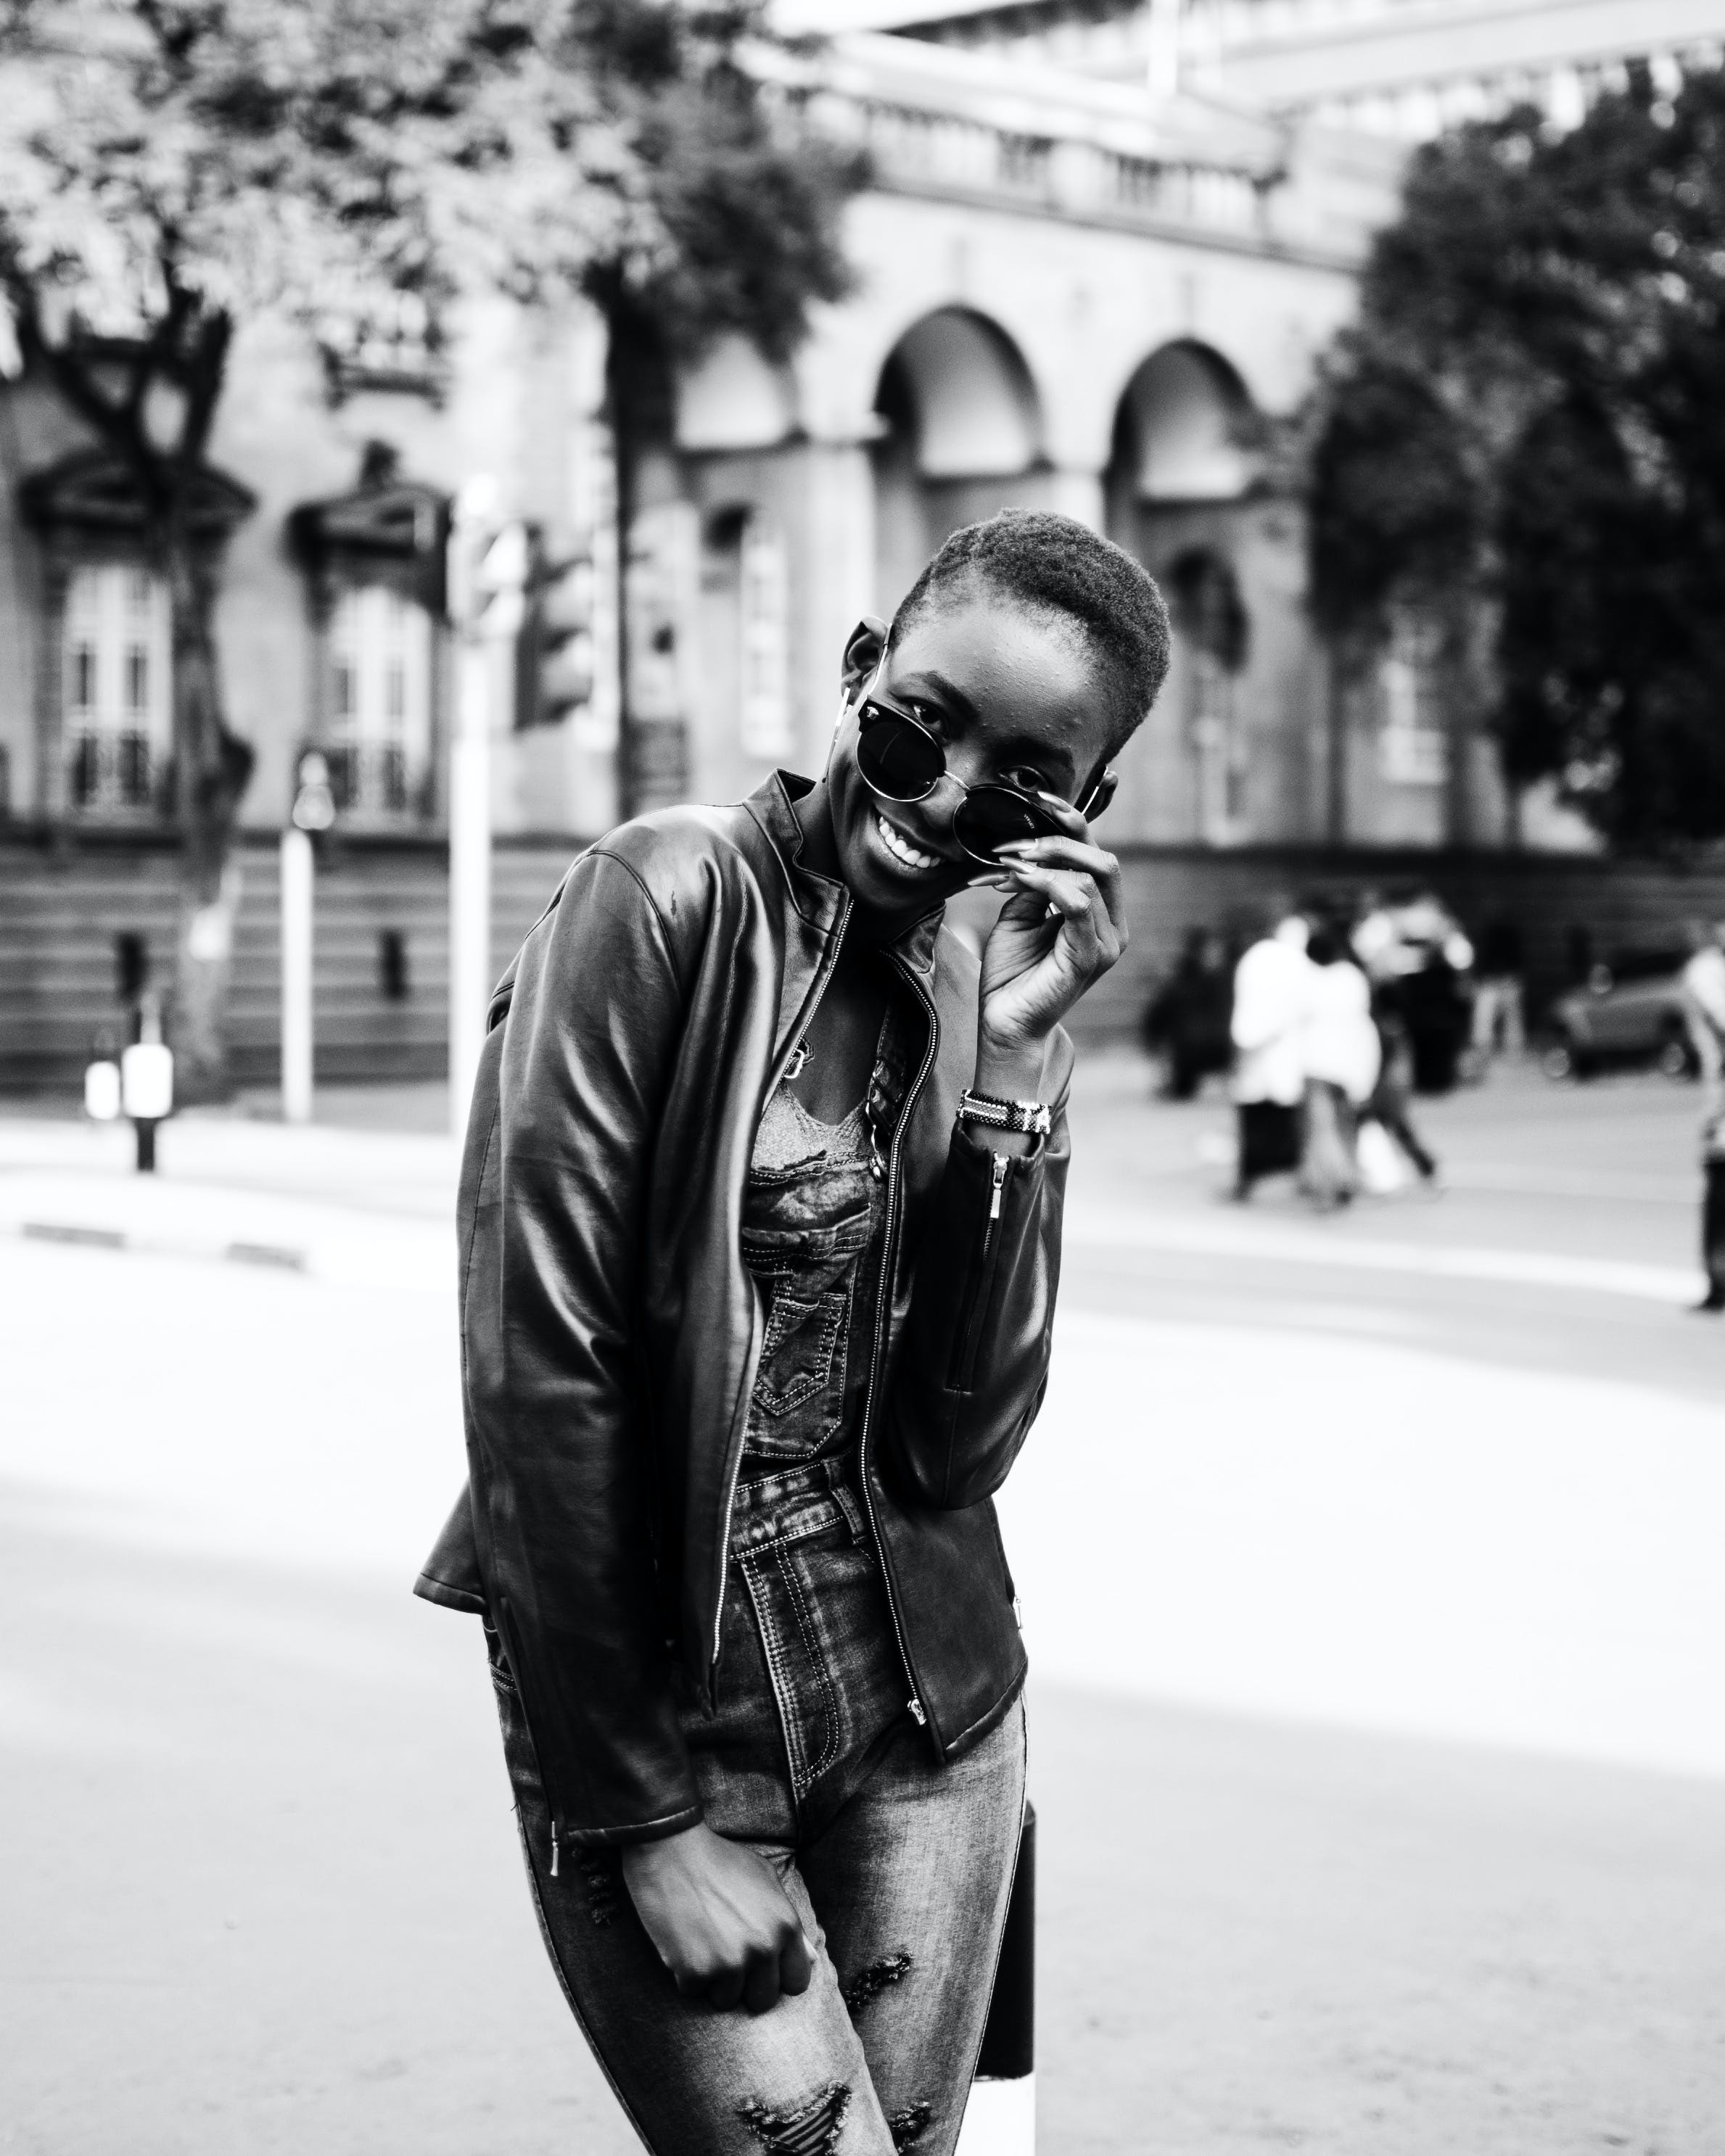 Monochrome Photo of Woman Wearing Leather Jacket